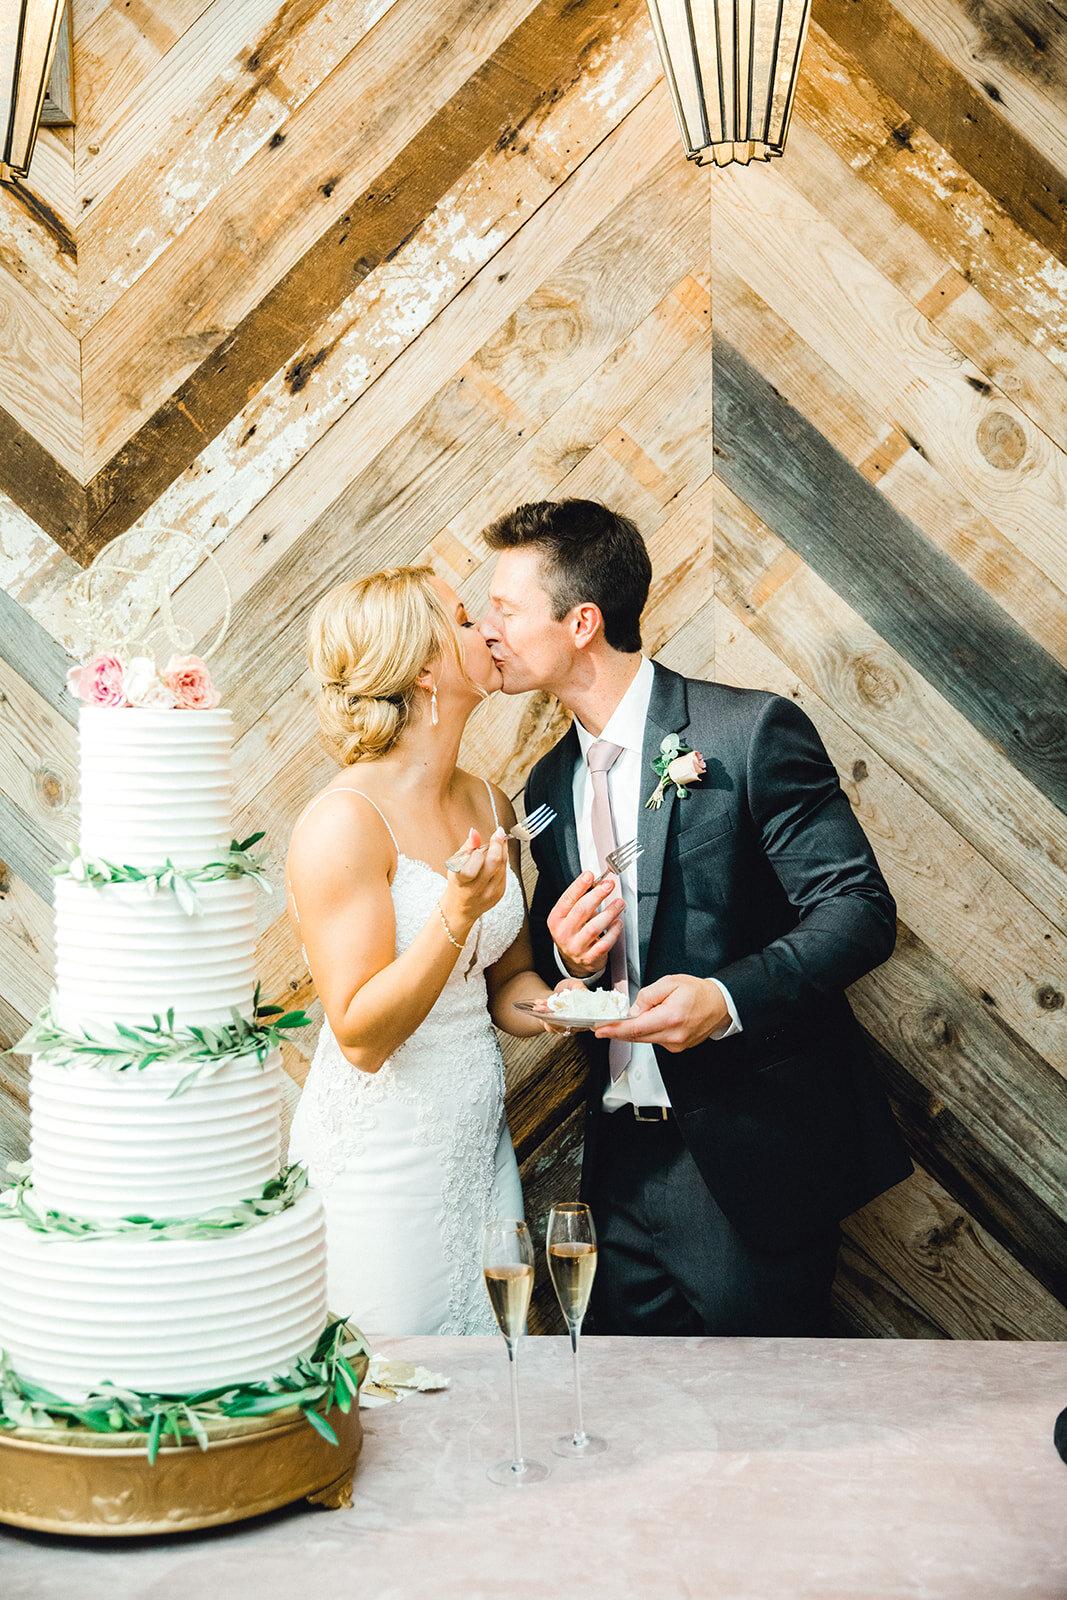 bride and groomb cake cutting.jpg